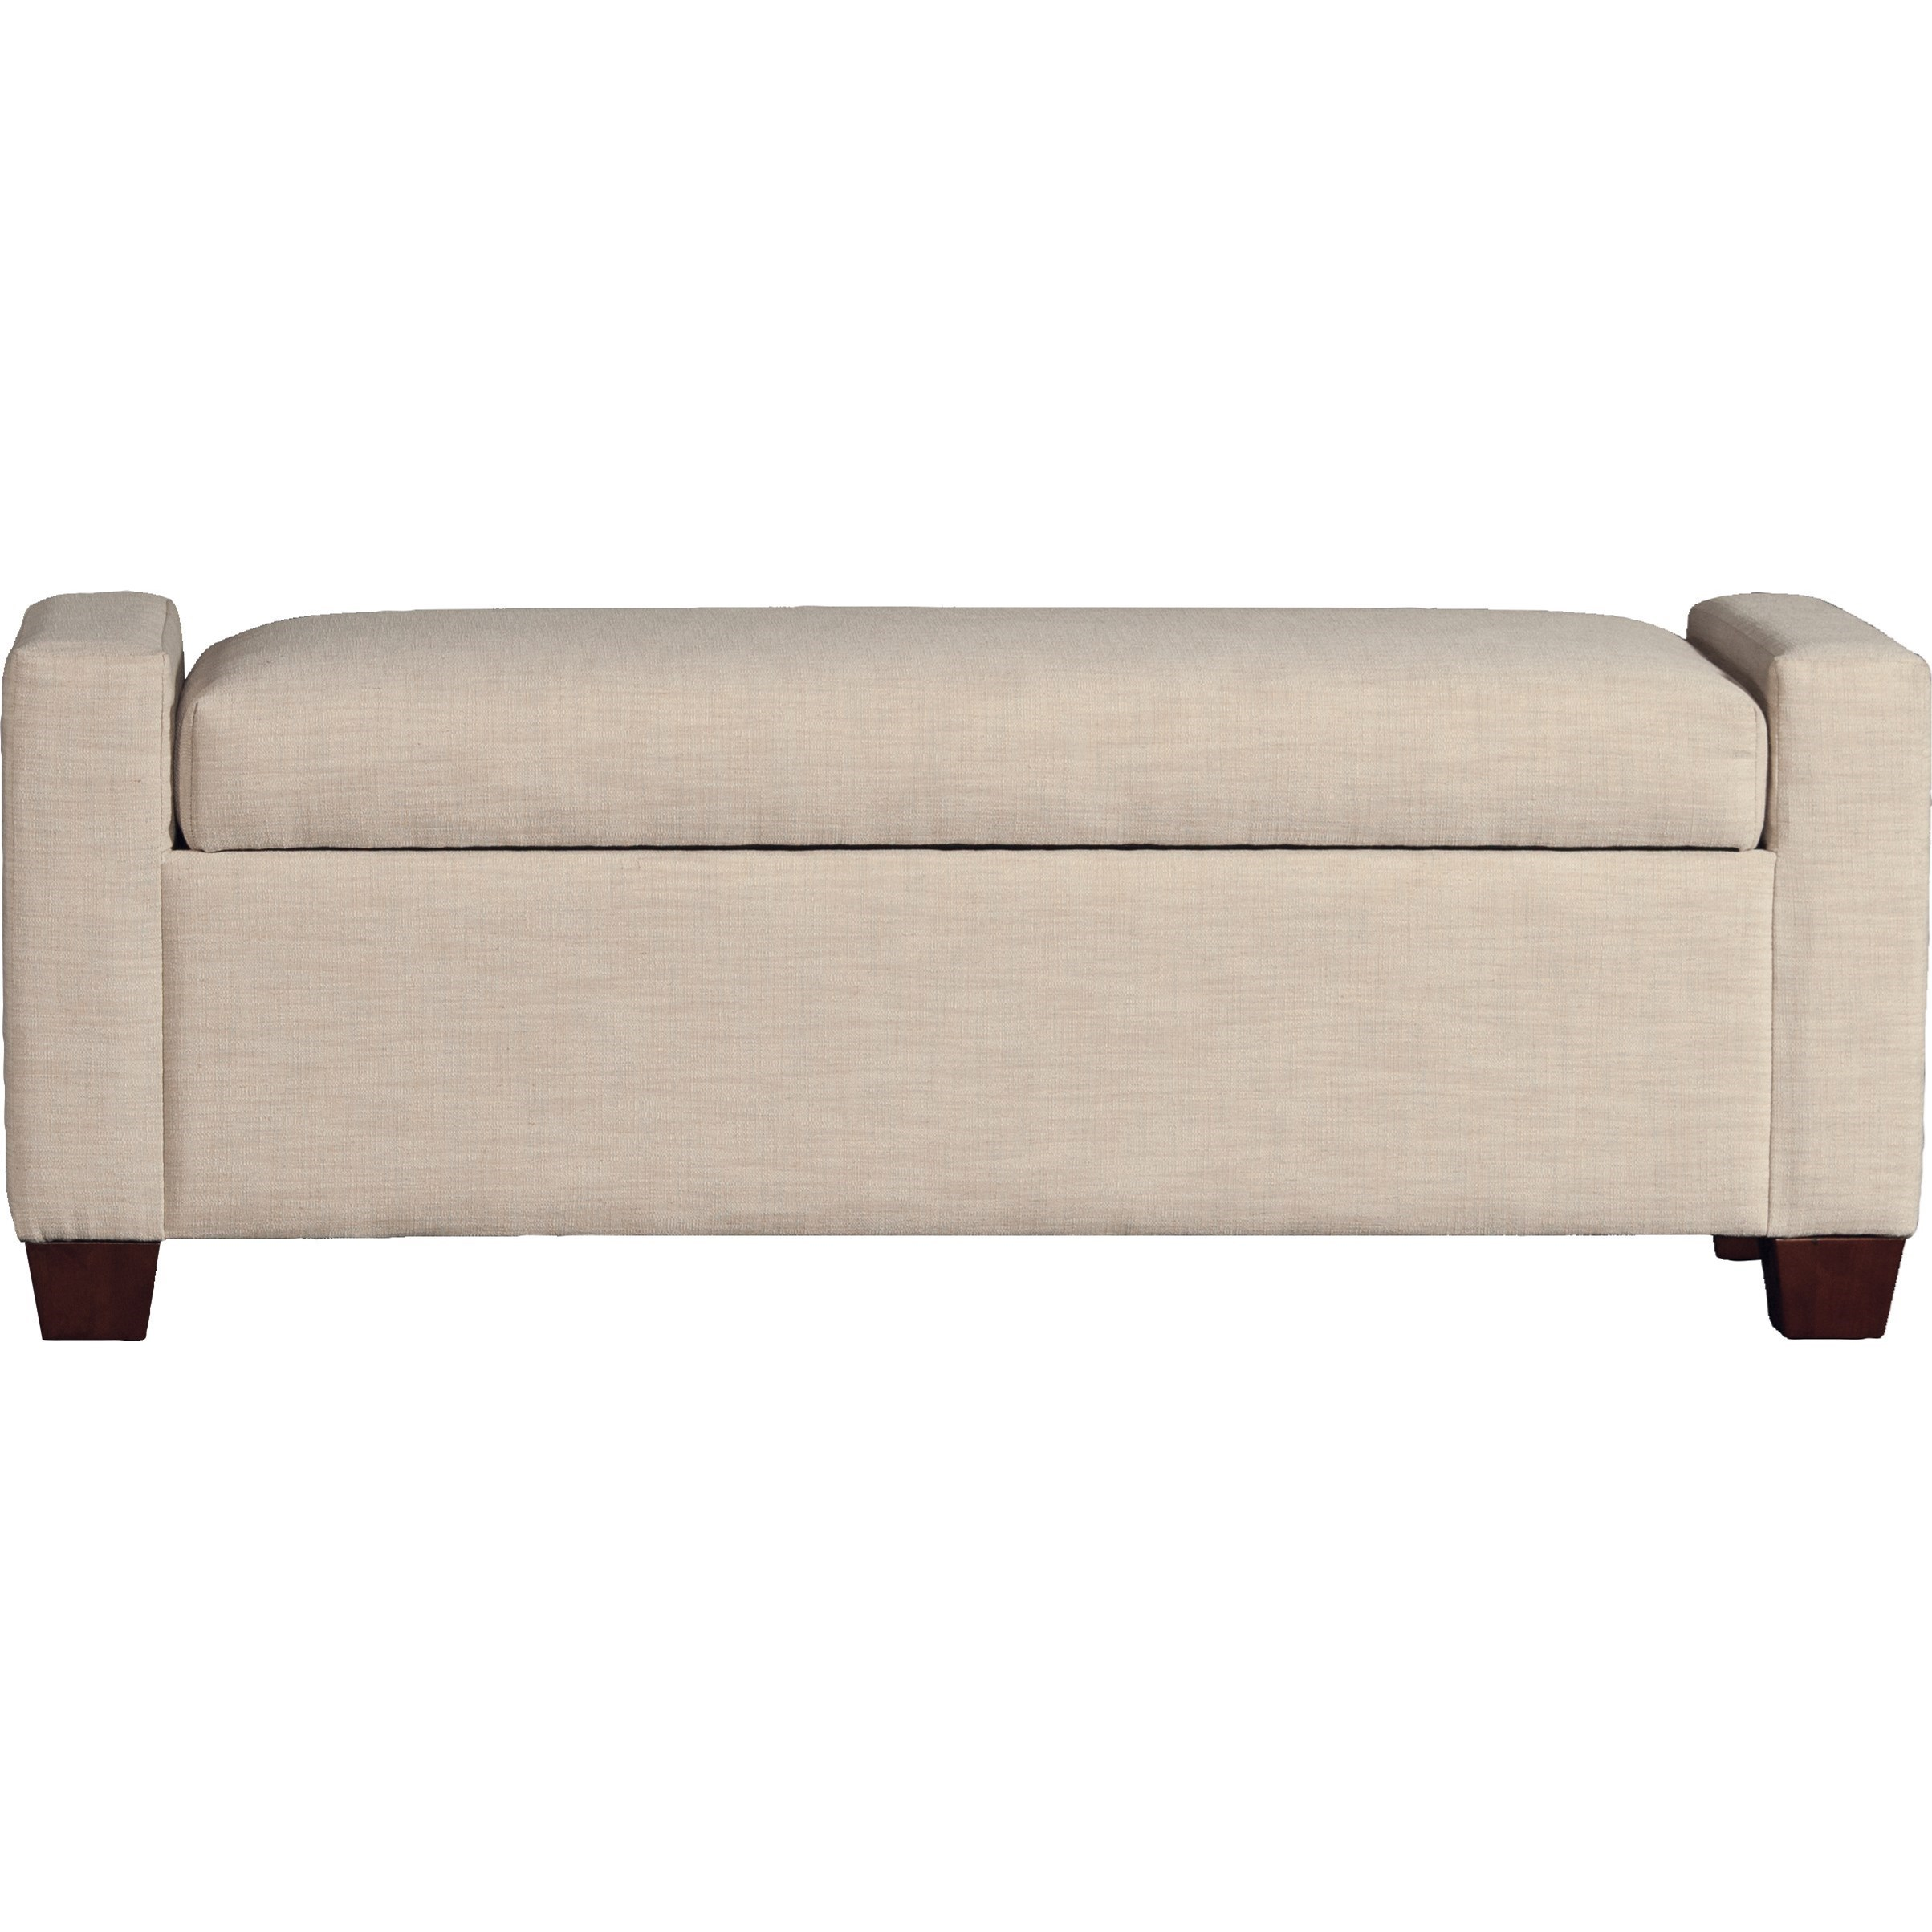 7120 Standard Storage Bench by Mayo at Pedigo Furniture